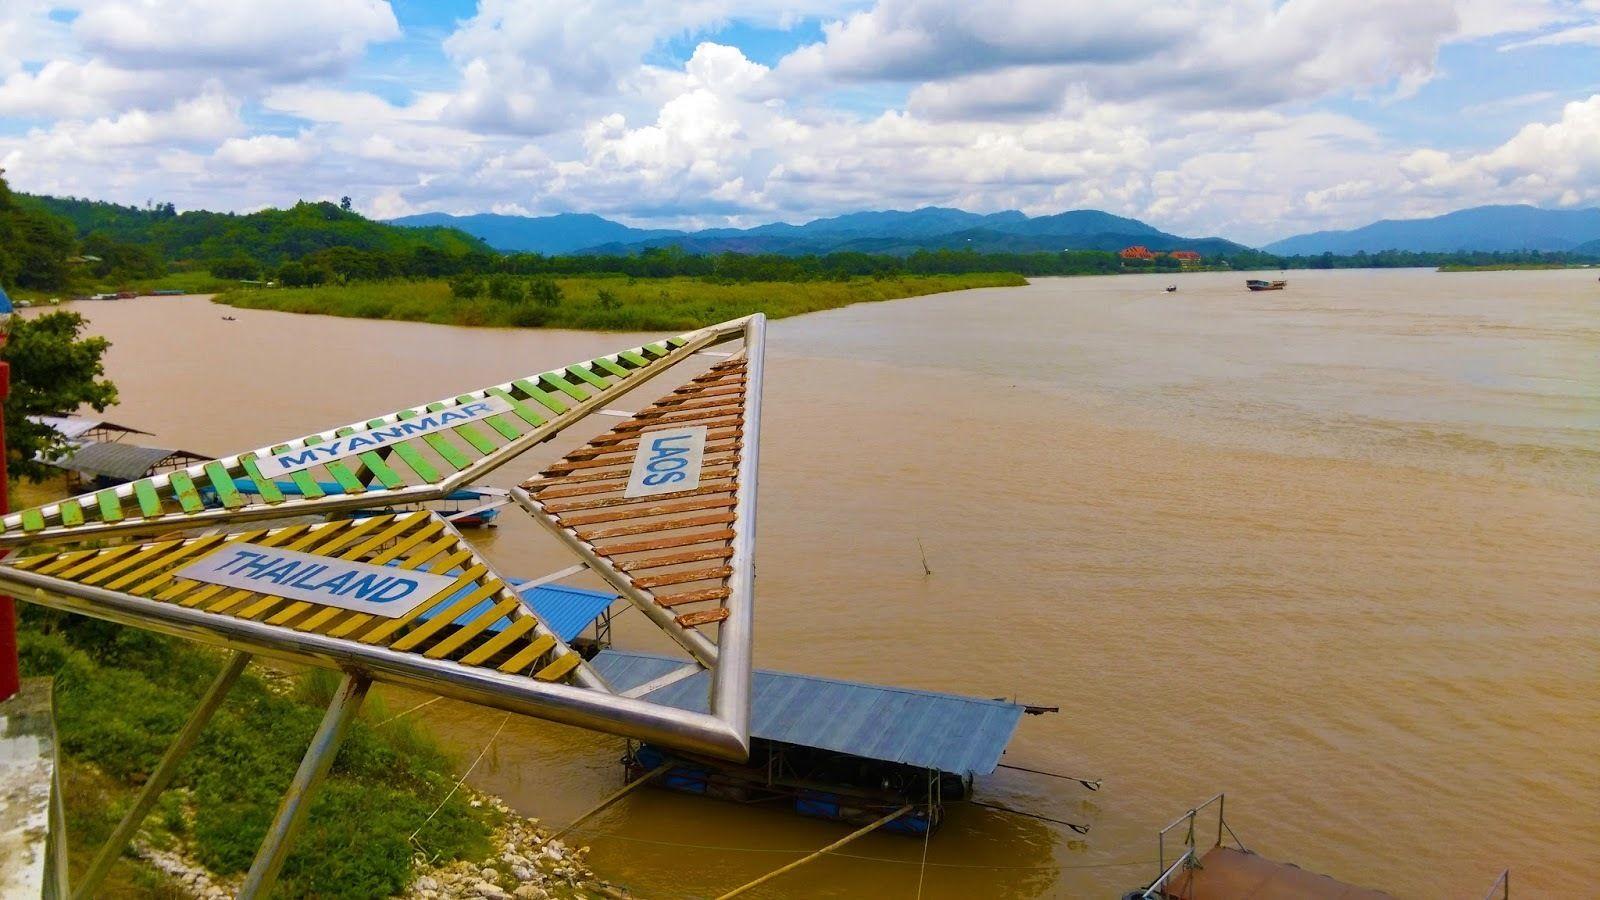 Chiang Rai & Golden Triangle Border Tour